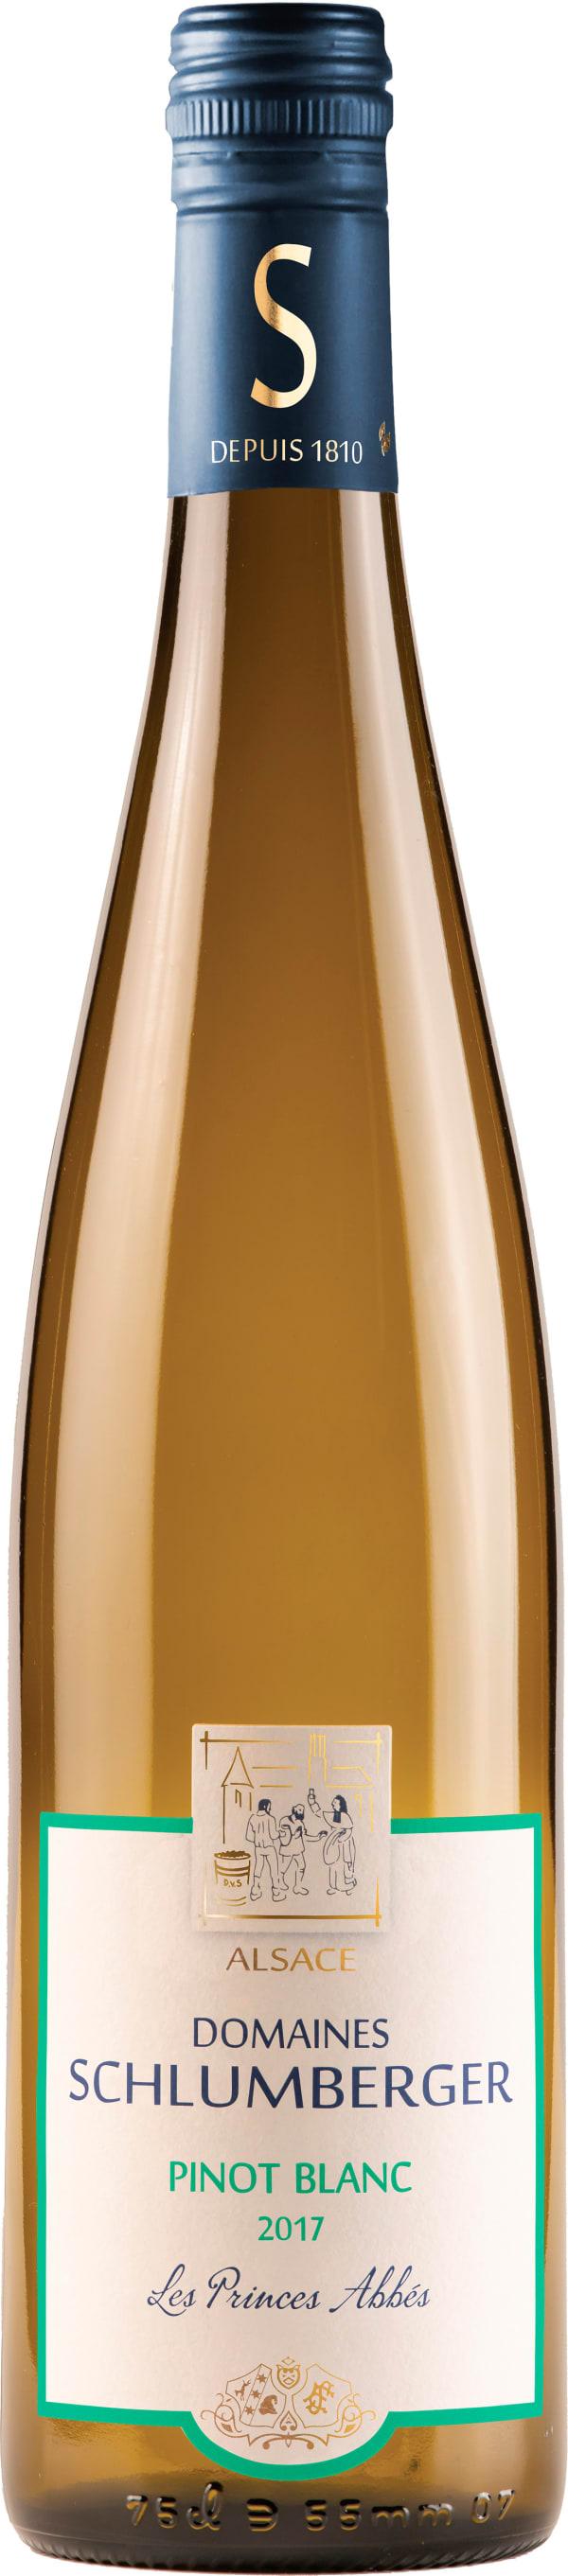 Domaines Schlumberger Pinot Blanc Les Princes Abbés 2015